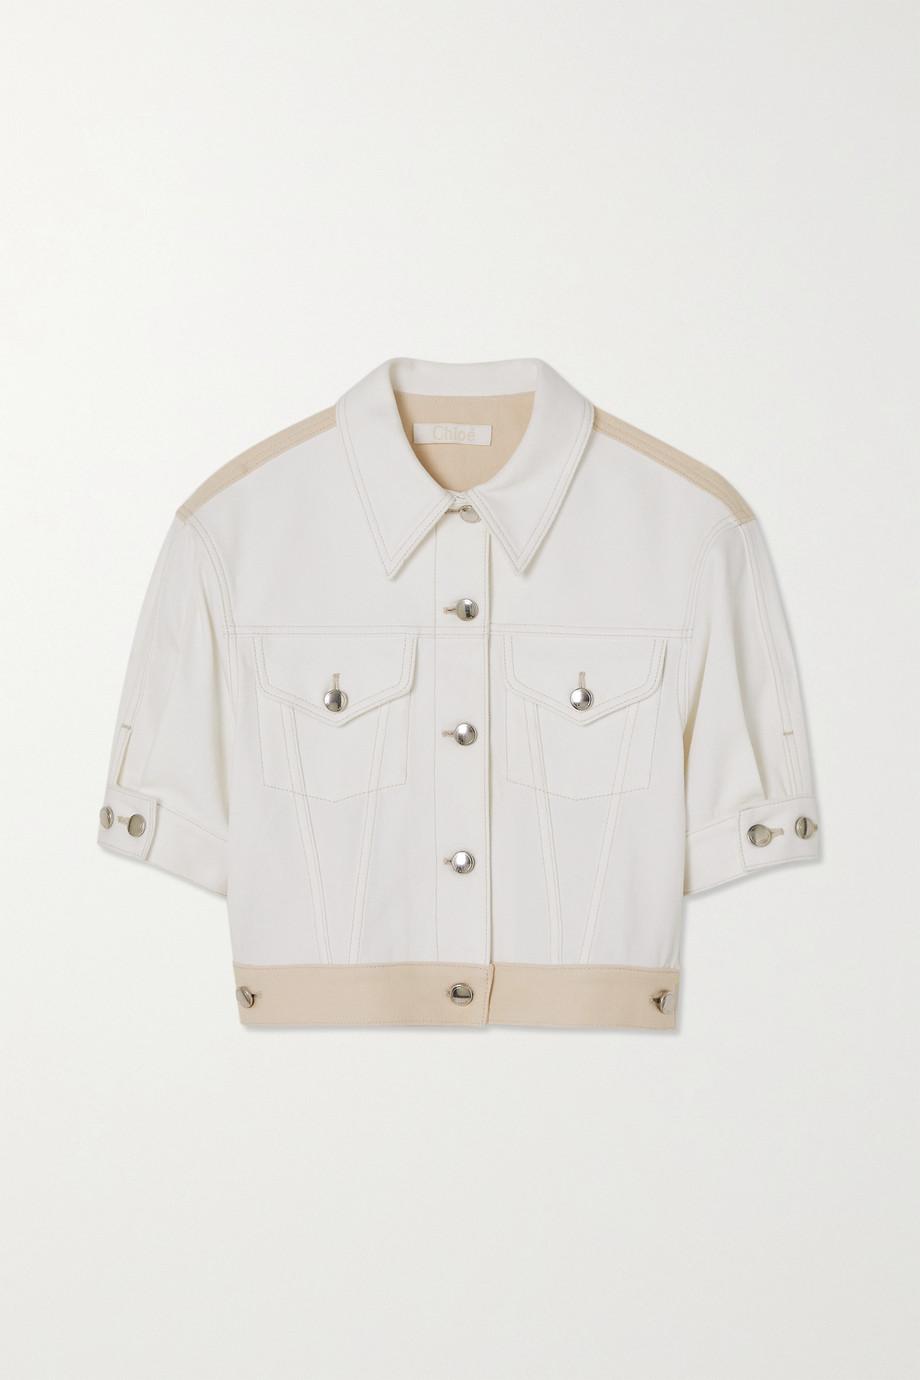 Chloé Two-tone printed denim jacket